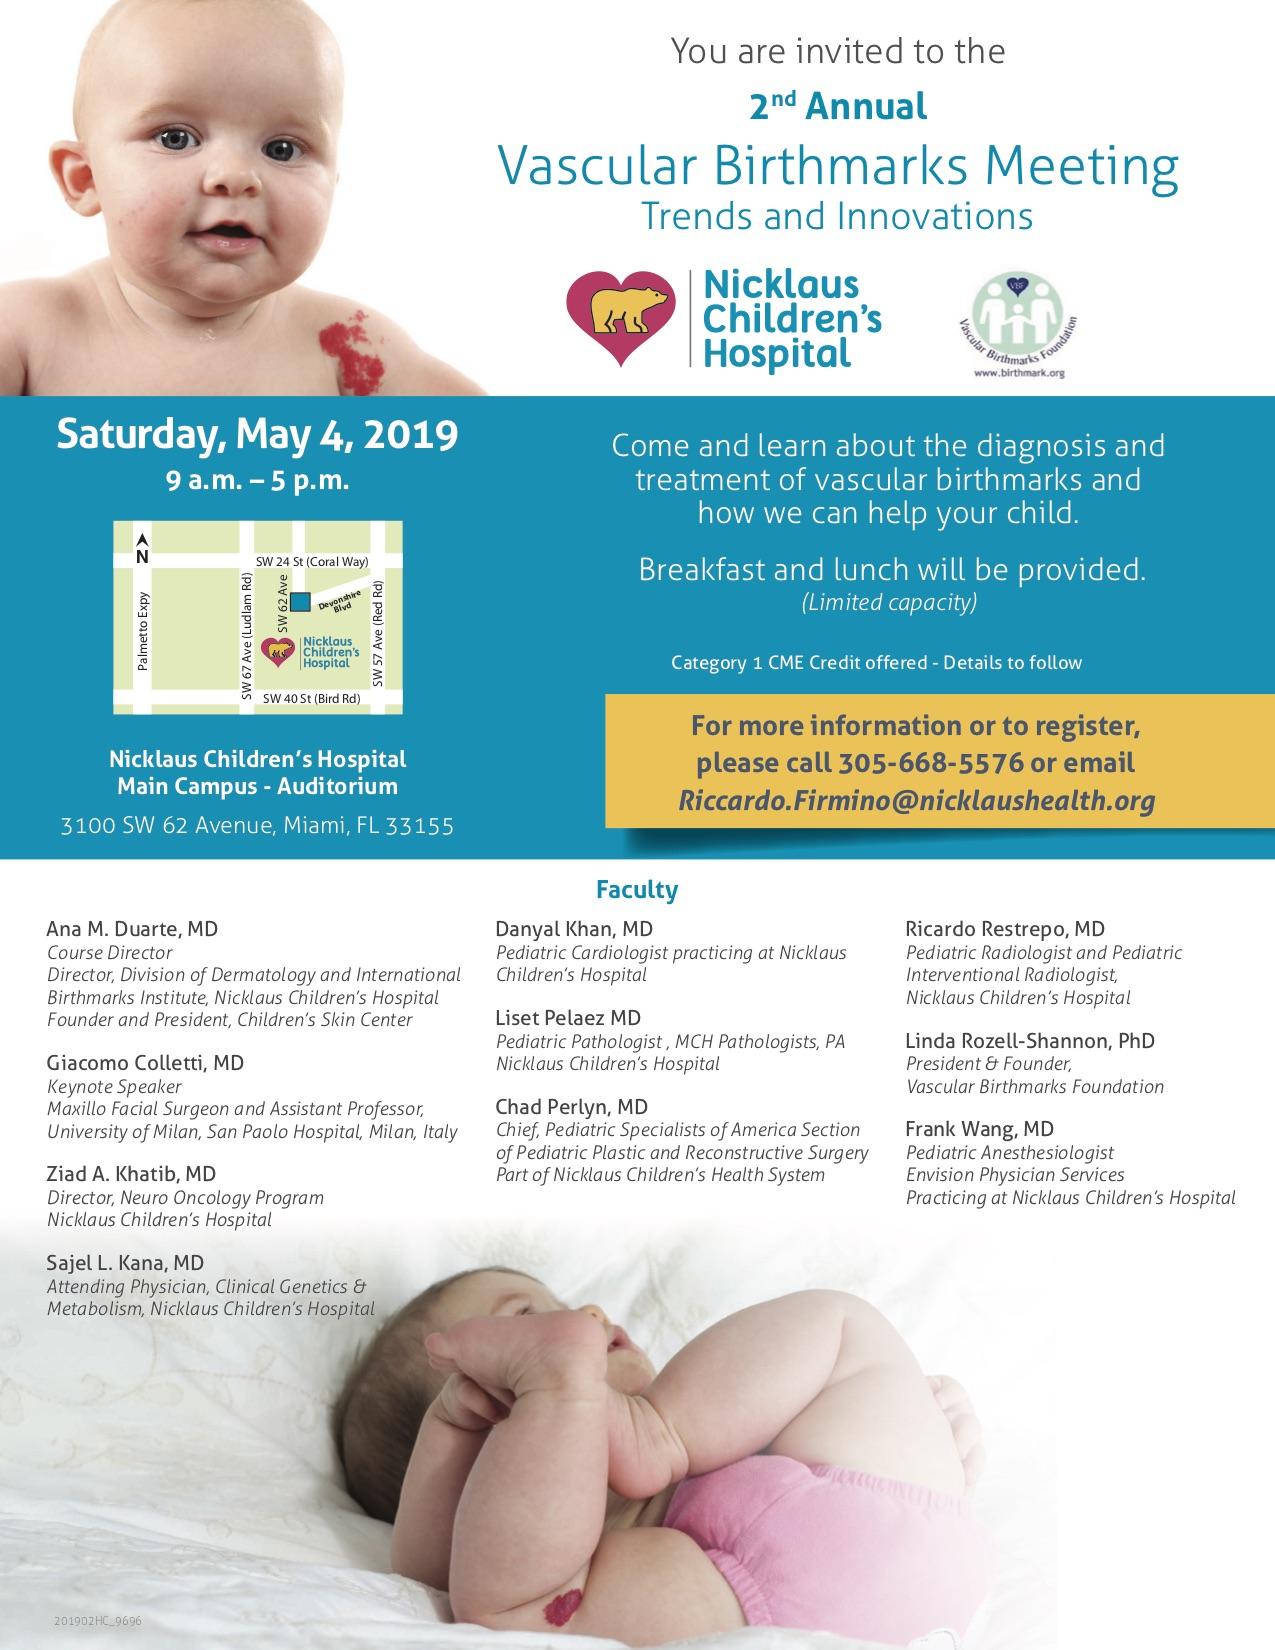 Annual Vascular Birthmarks Meeting in Miami - Vascular